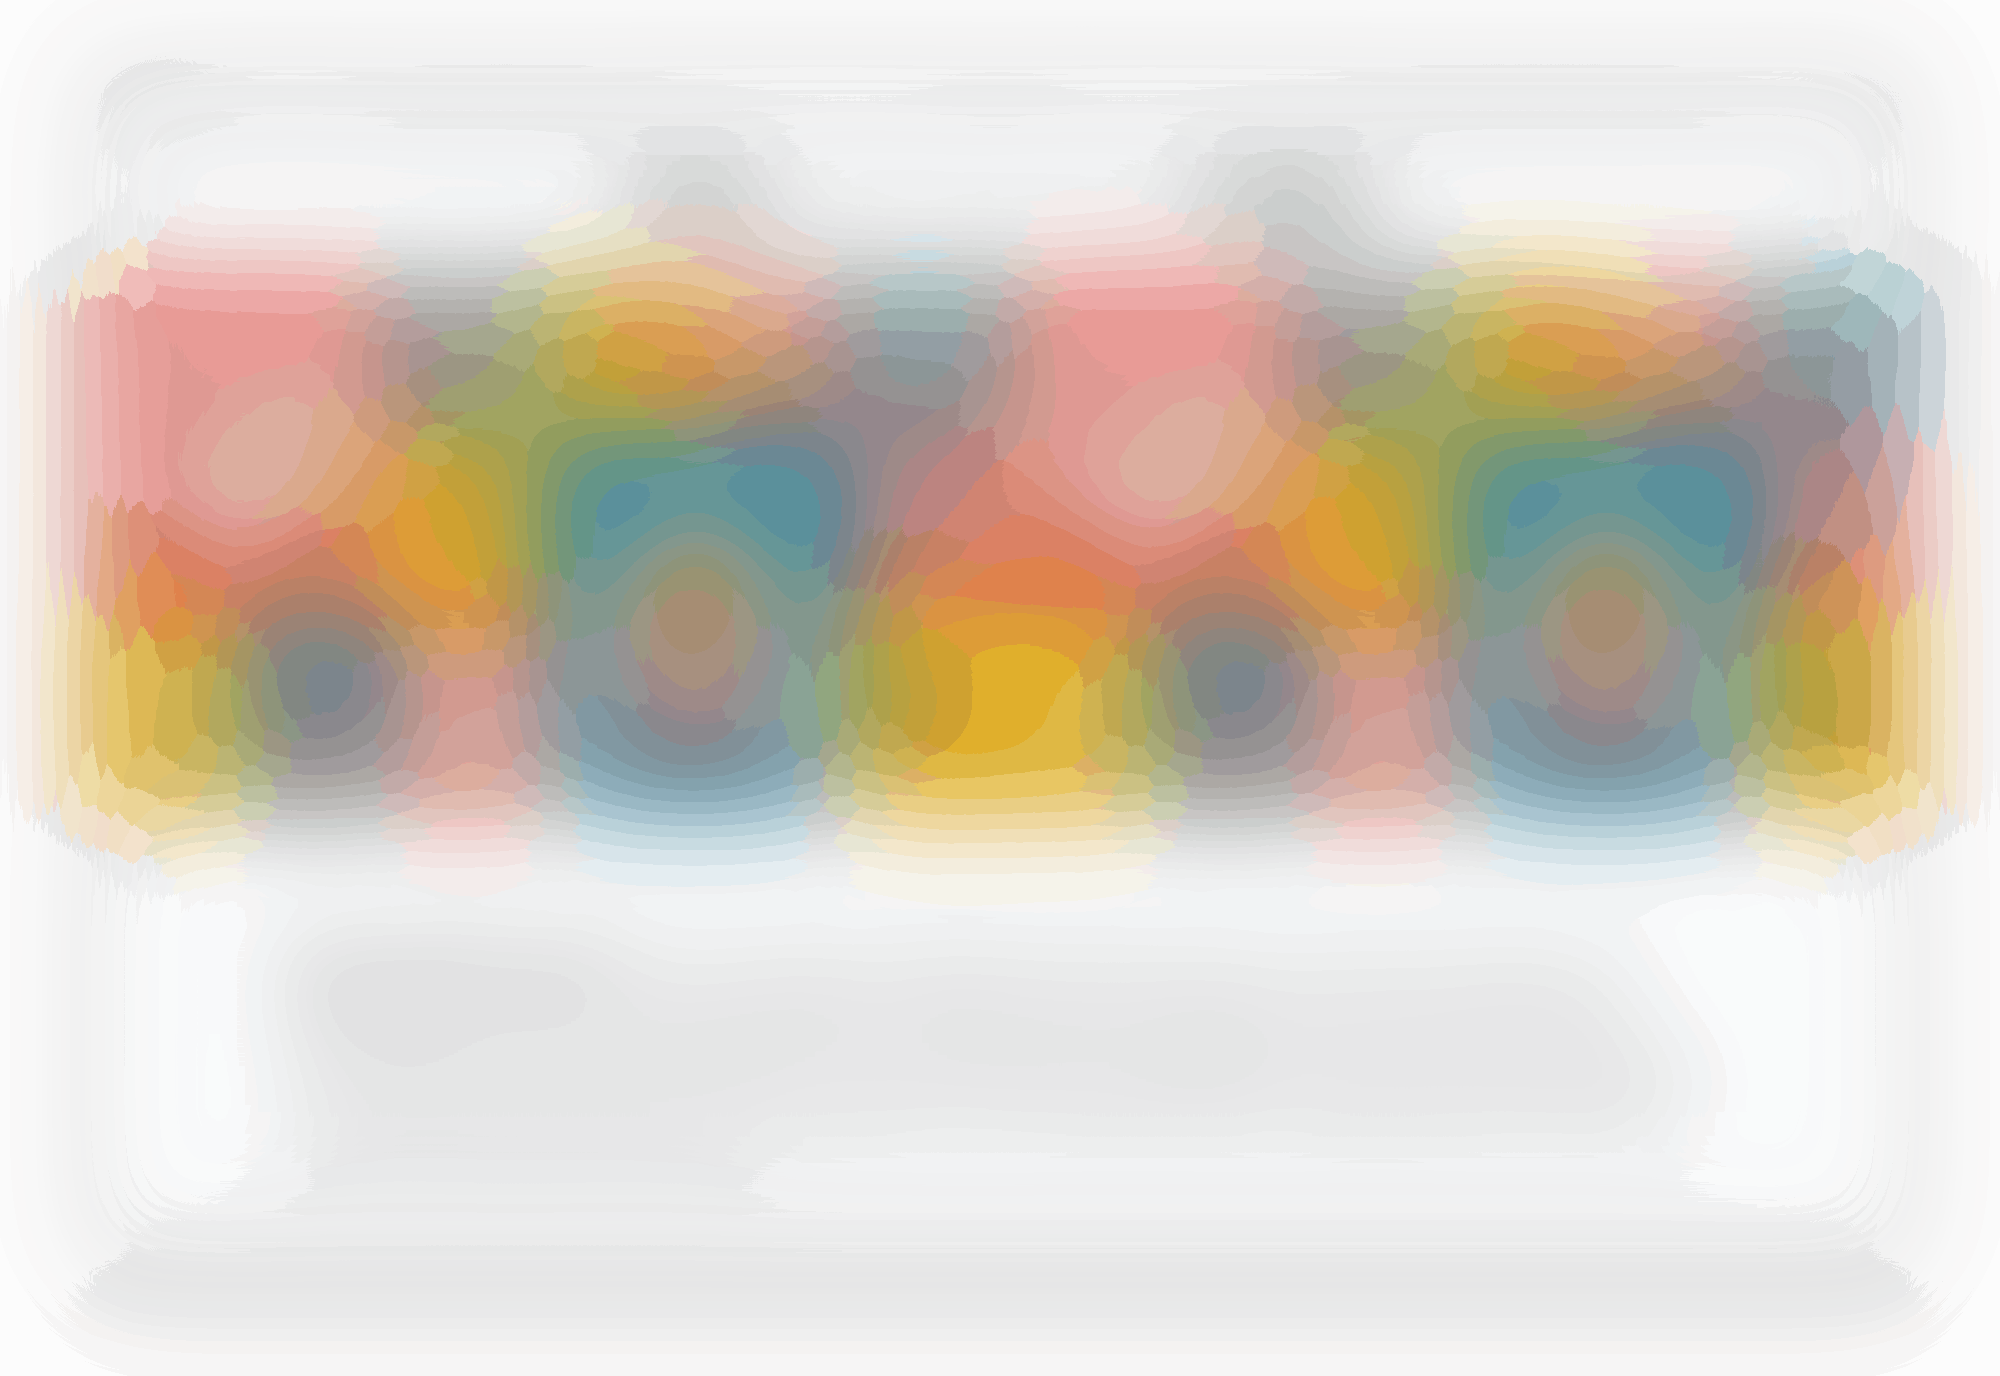 Screenshot 2020 07 30 at 11 35 47 autocompressfitresizeixlibphp 1 1 0max h2000max w3 D2000q80se2d1593fdcc0c13487ce4592b6c74ab0